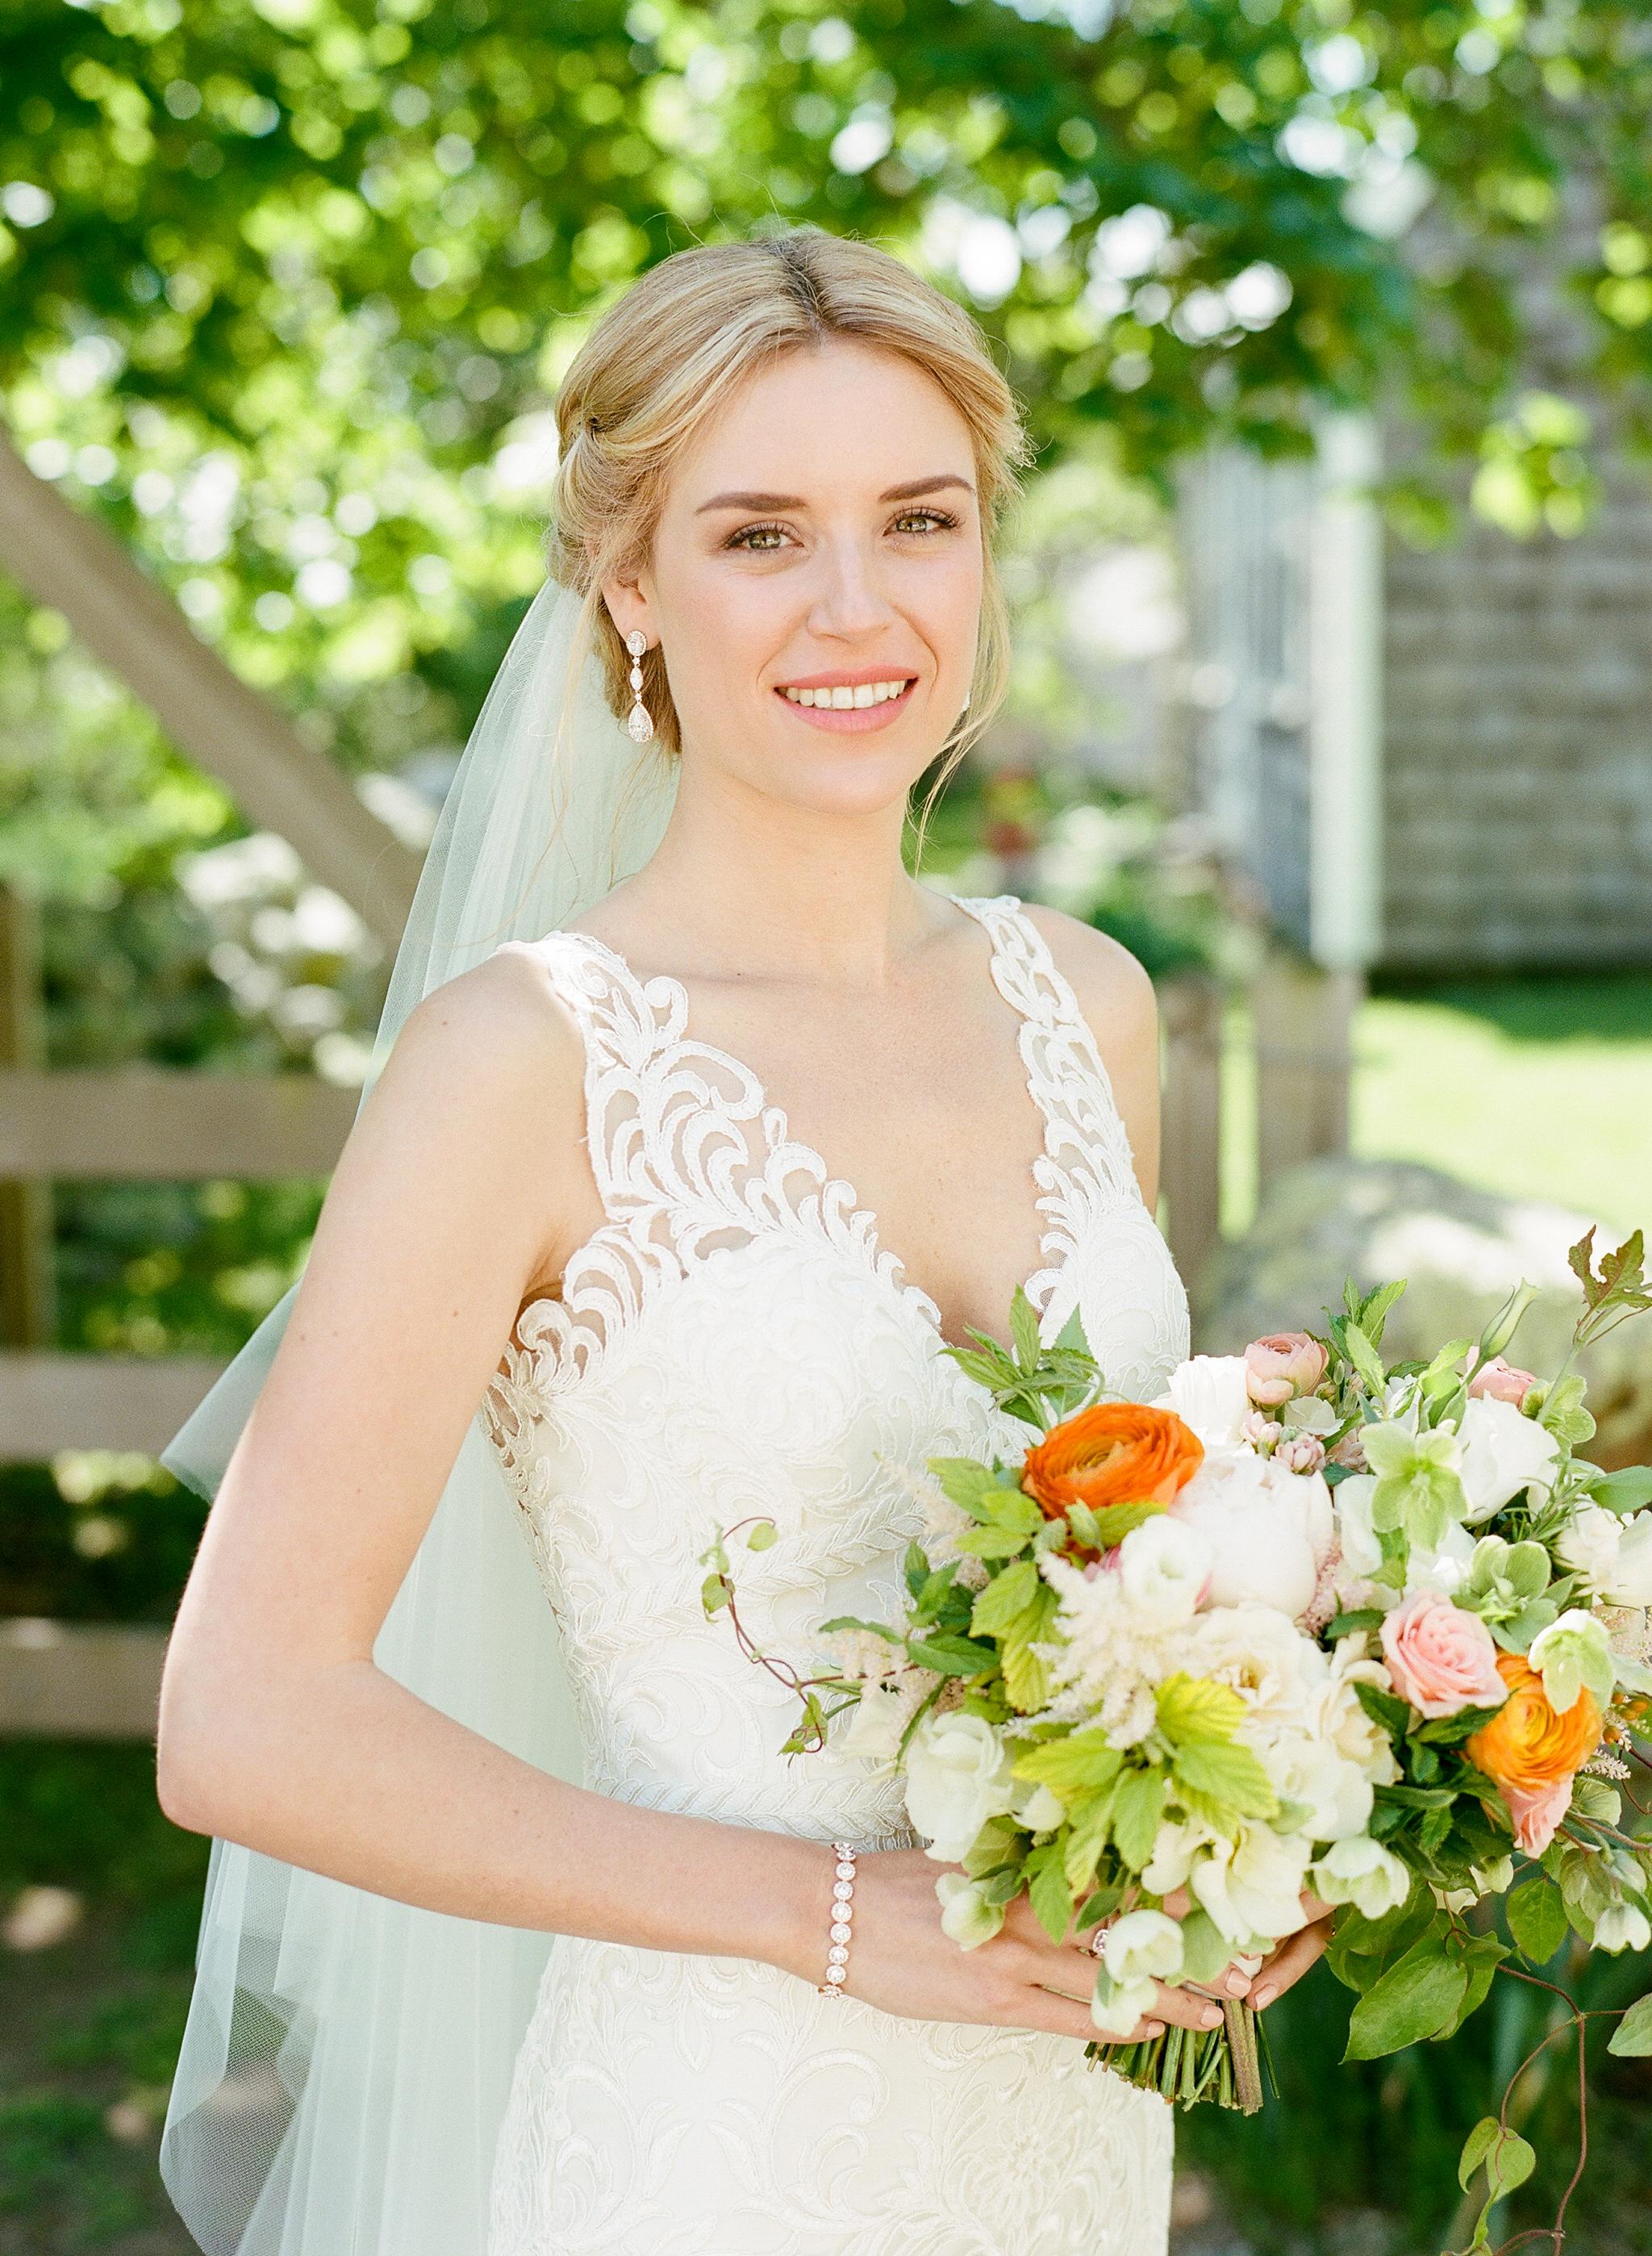 Morrice Florist weddings